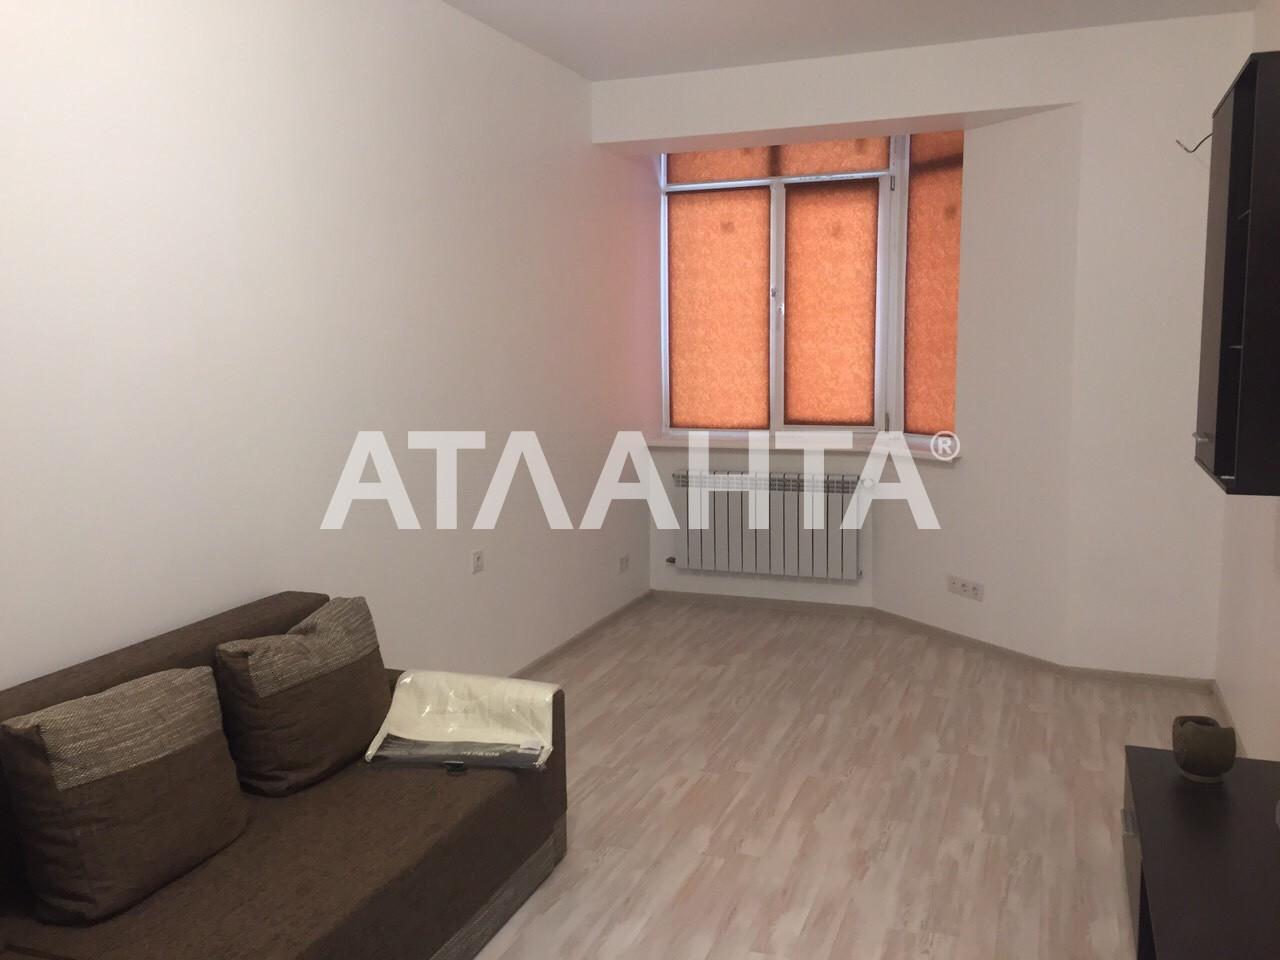 Продается 1-комнатная Квартира на ул. Валовня — 42 000 у.е. (фото №2)